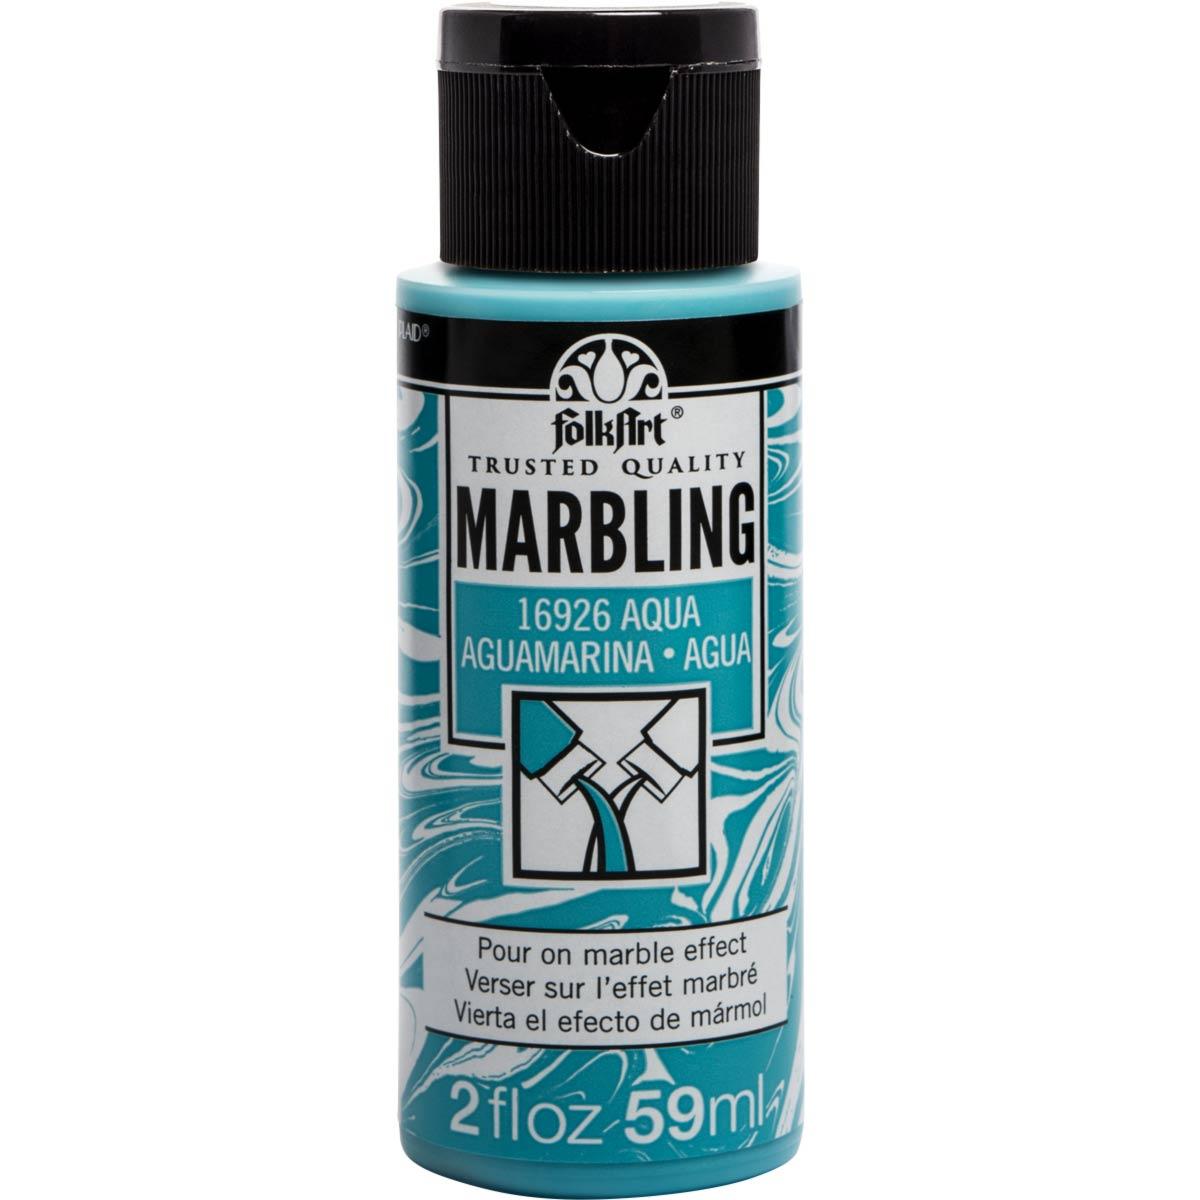 FolkArt ® Marbling Paint - Aqua, 2 oz. - 16926